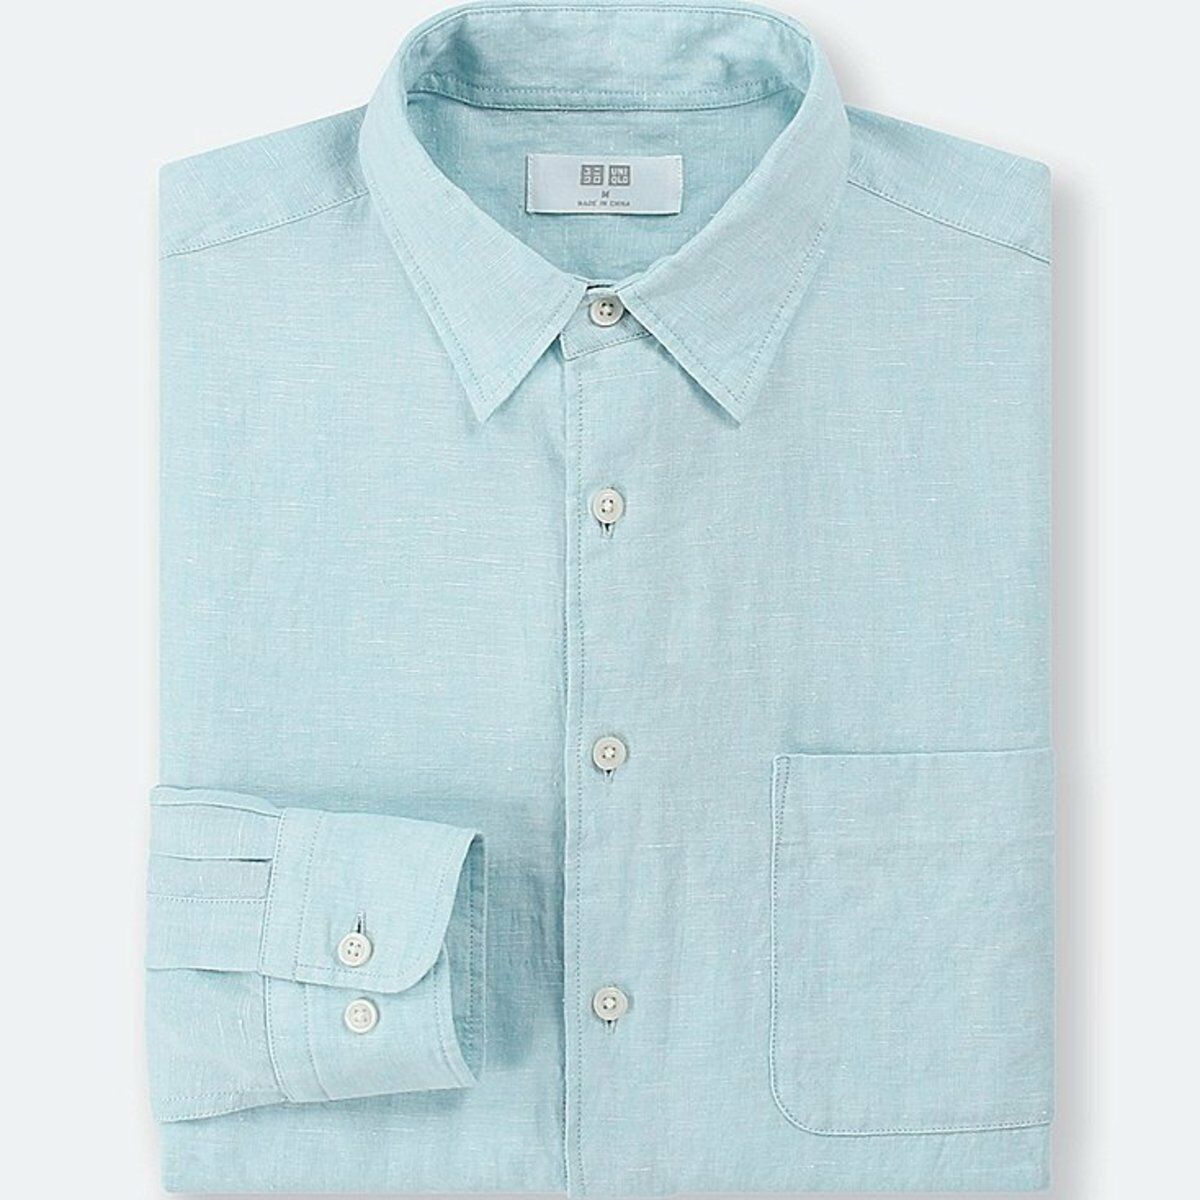 e59299b3 UNIQLO Men's Premium Linen Long-Sleeve Shirt L GREEN (51) NWT French ...